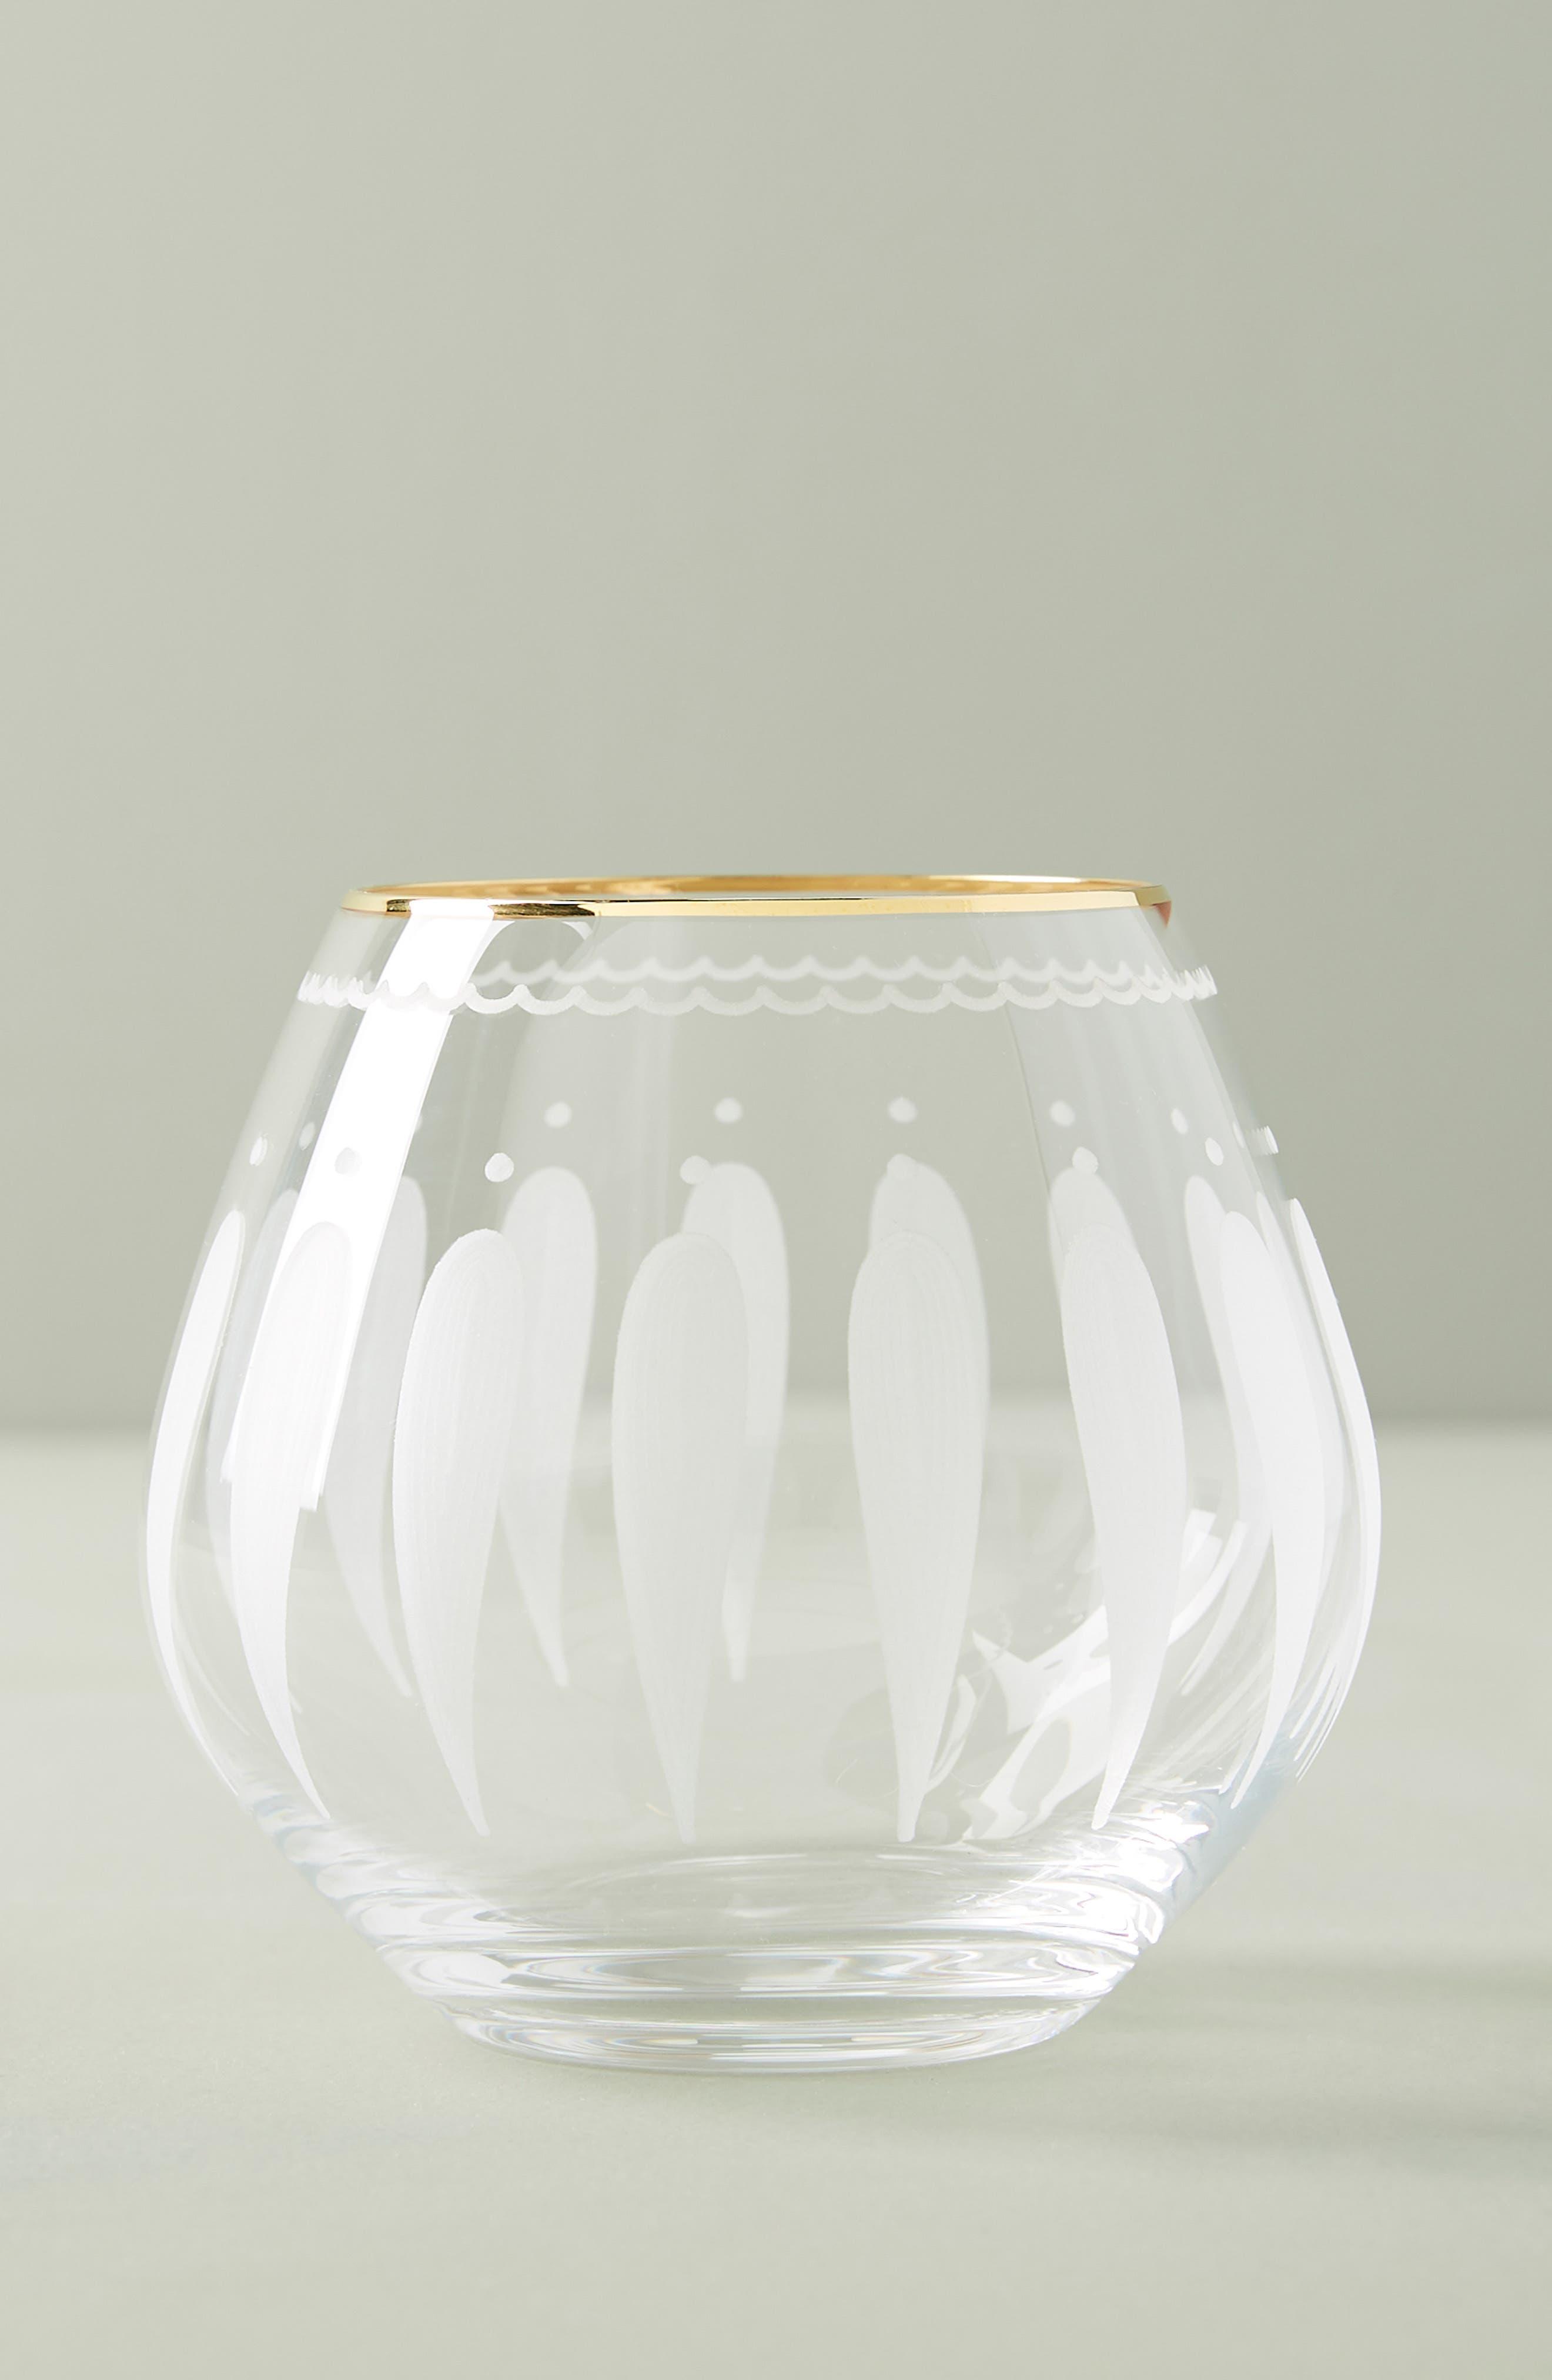 Odele Set of 4 Stemless Wine Glasses, Main, color, CLEAR